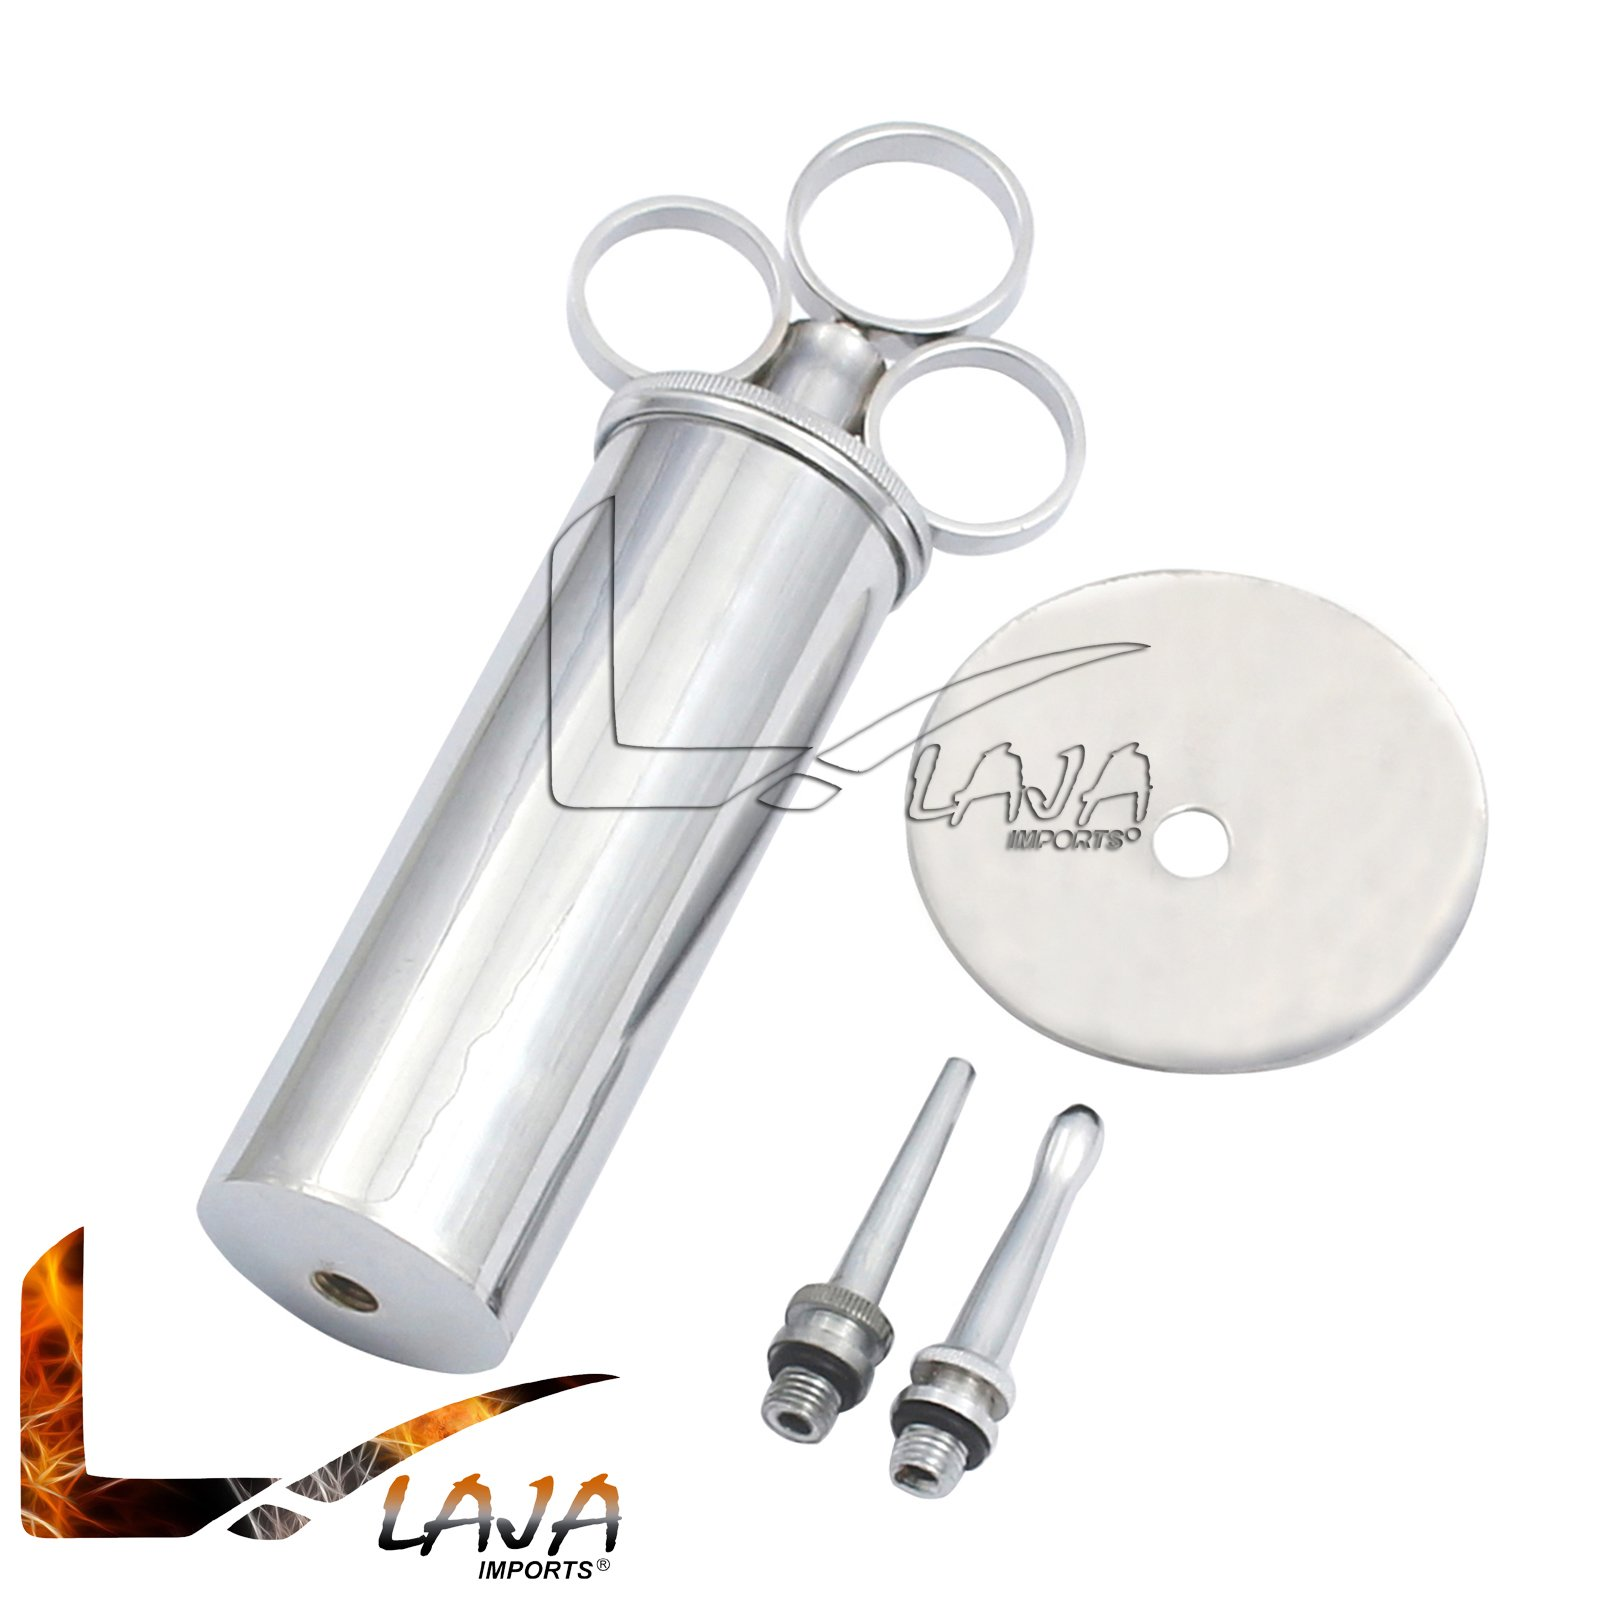 LAJA Imports Ear Enemma Syringe 8oz Veterinary Instruments